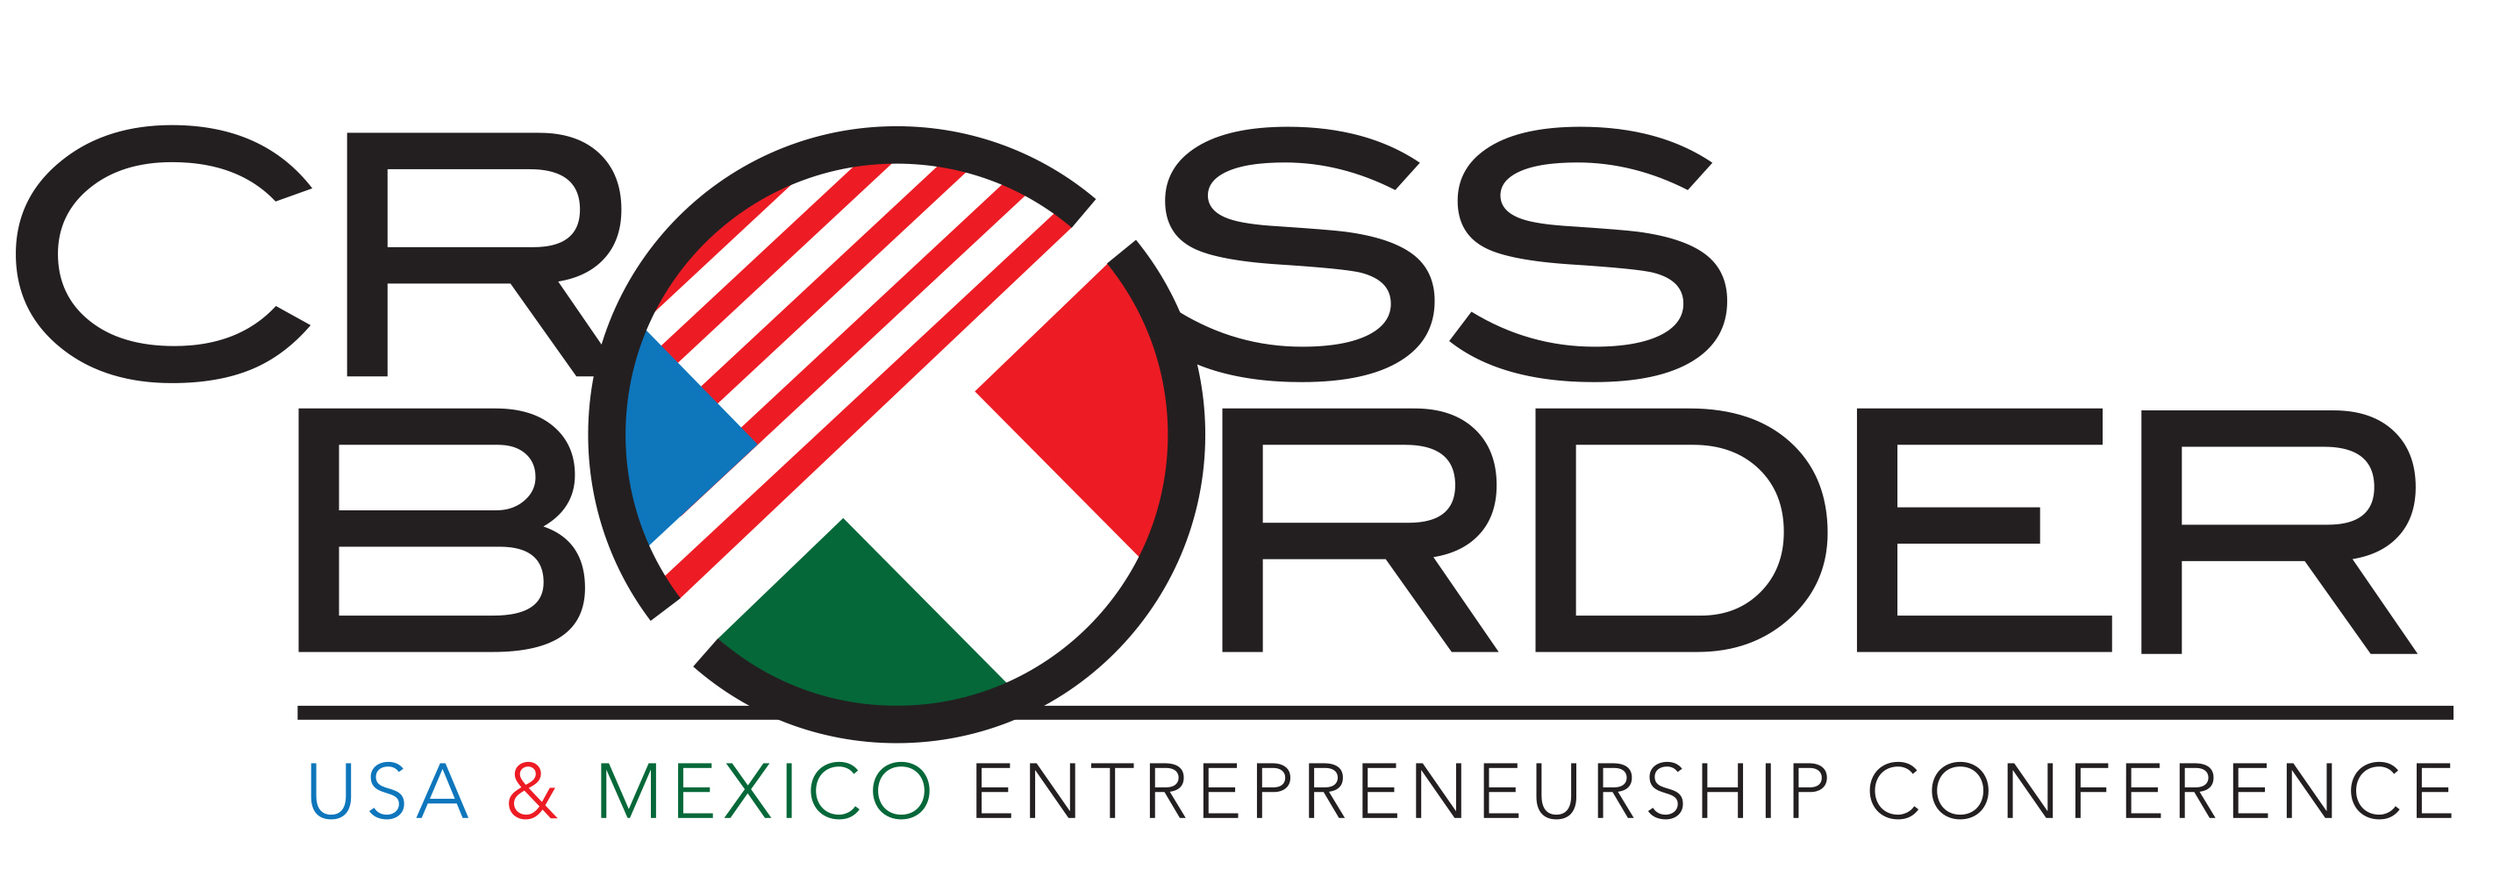 Cross Border Logo